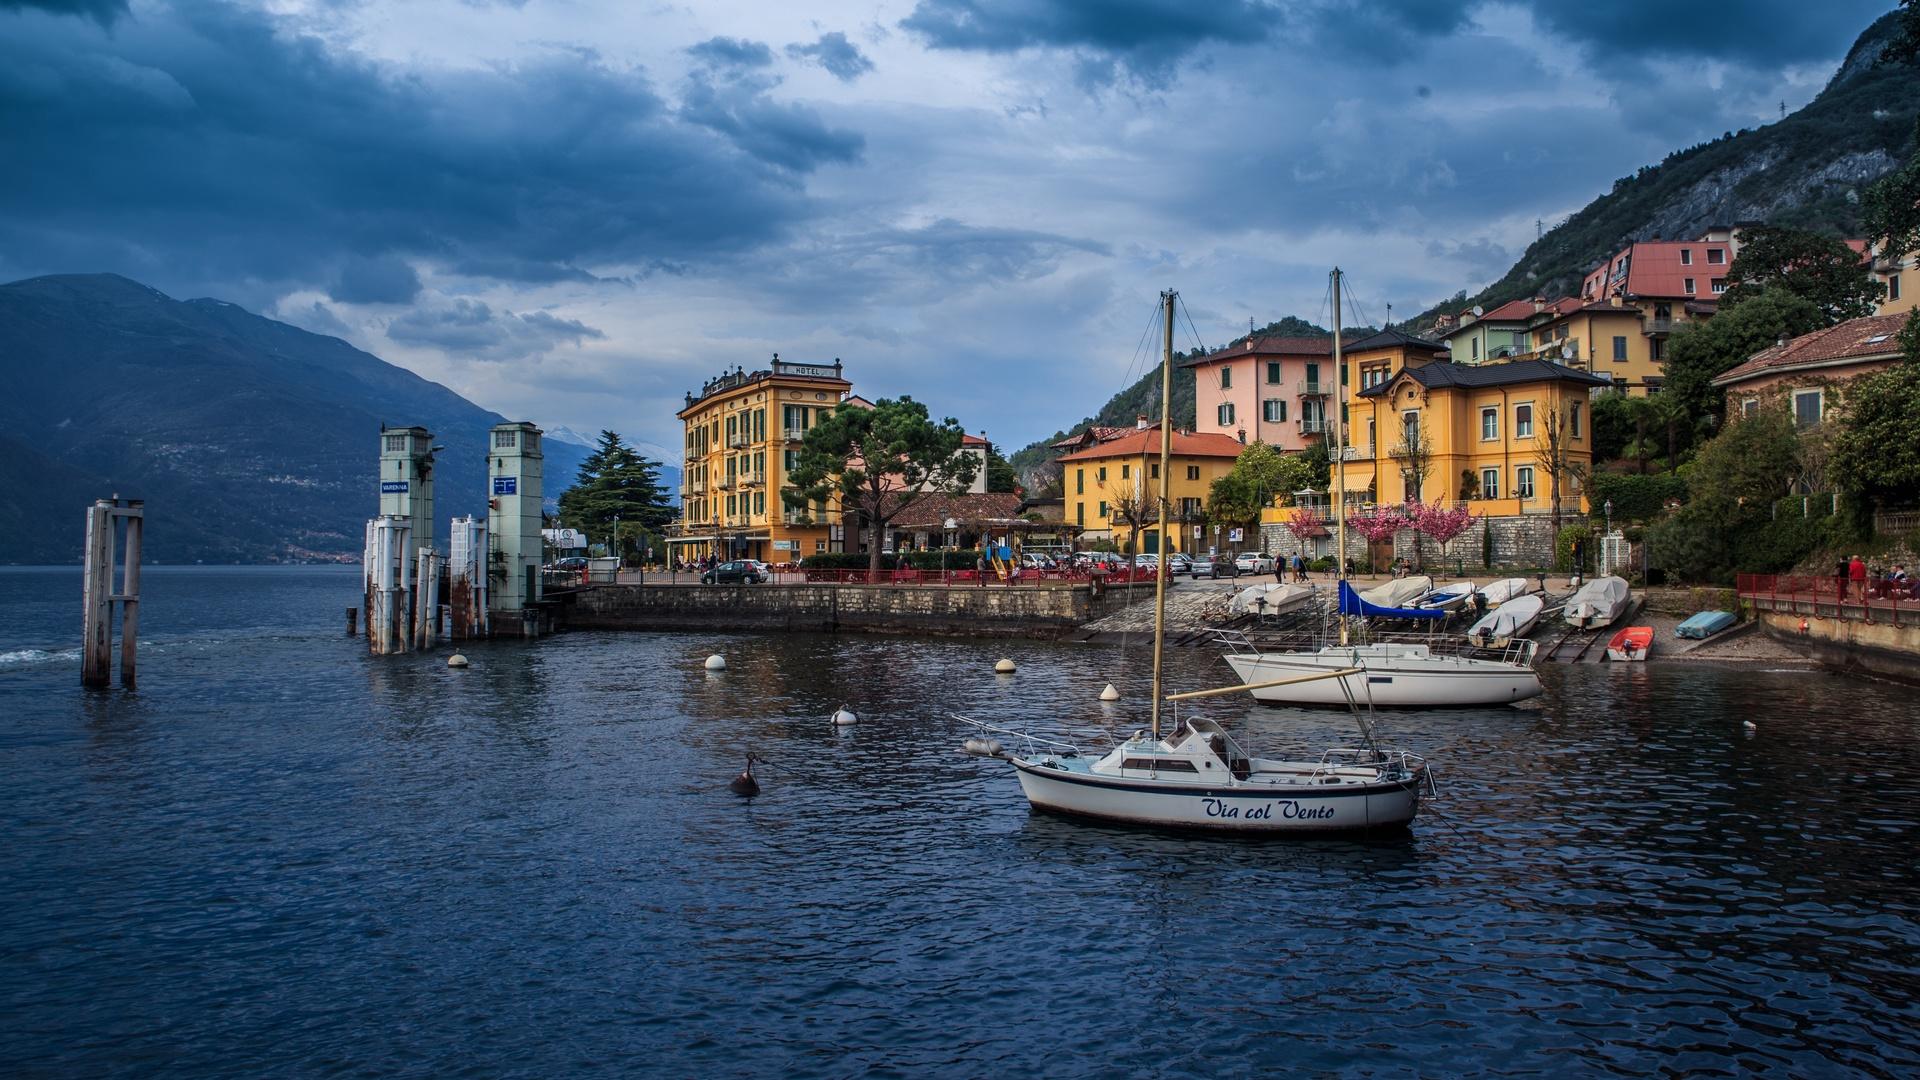 италия, море, дома, лодки, горы, lombardy, varenna, облака, набережная, природа